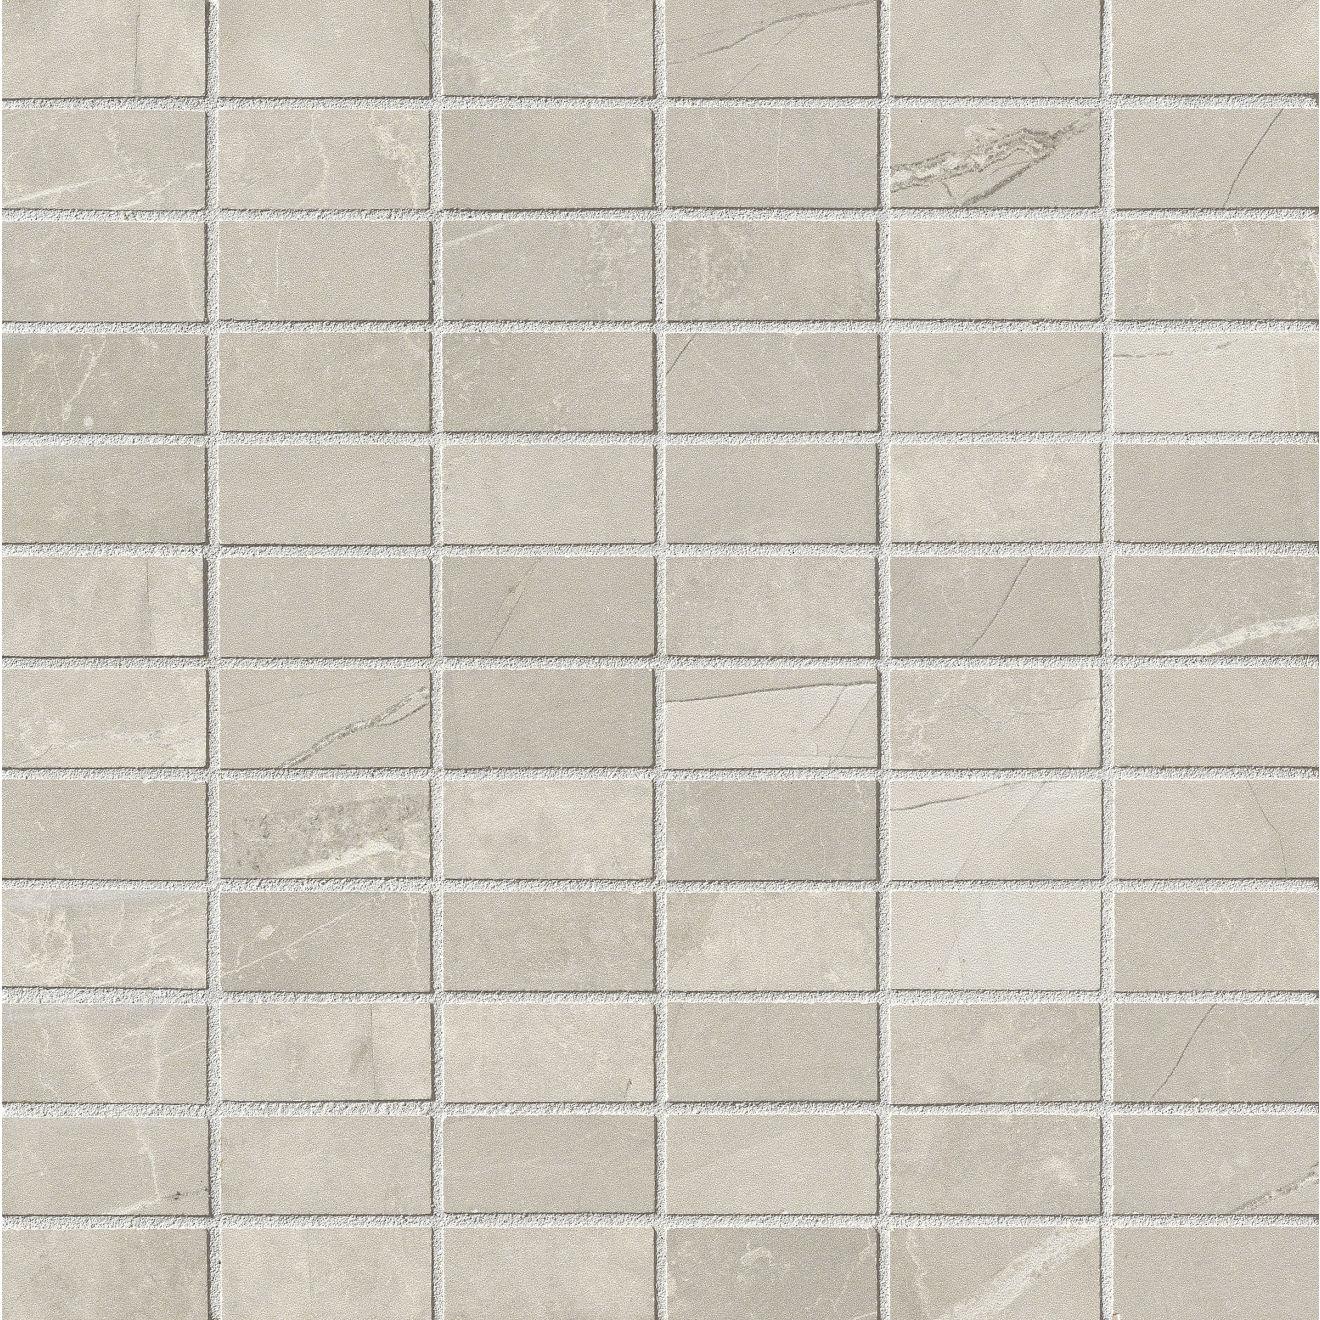 Pulpis Floor & Wall Mosaic in Grigio